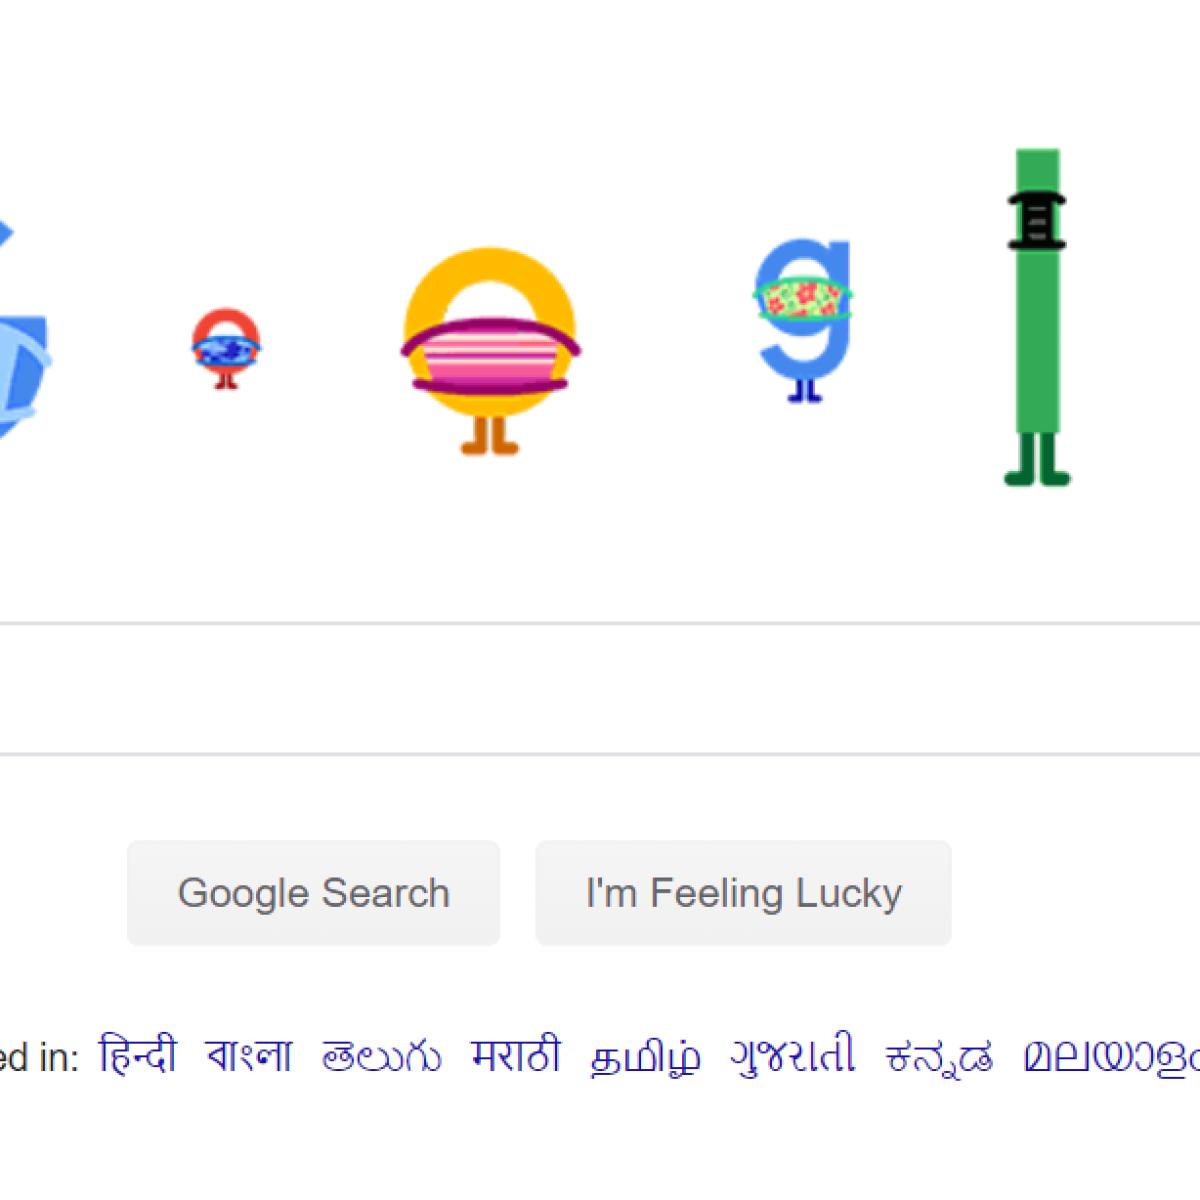 COVID-19: Forgot to wear face masks? Google Doodle got your back